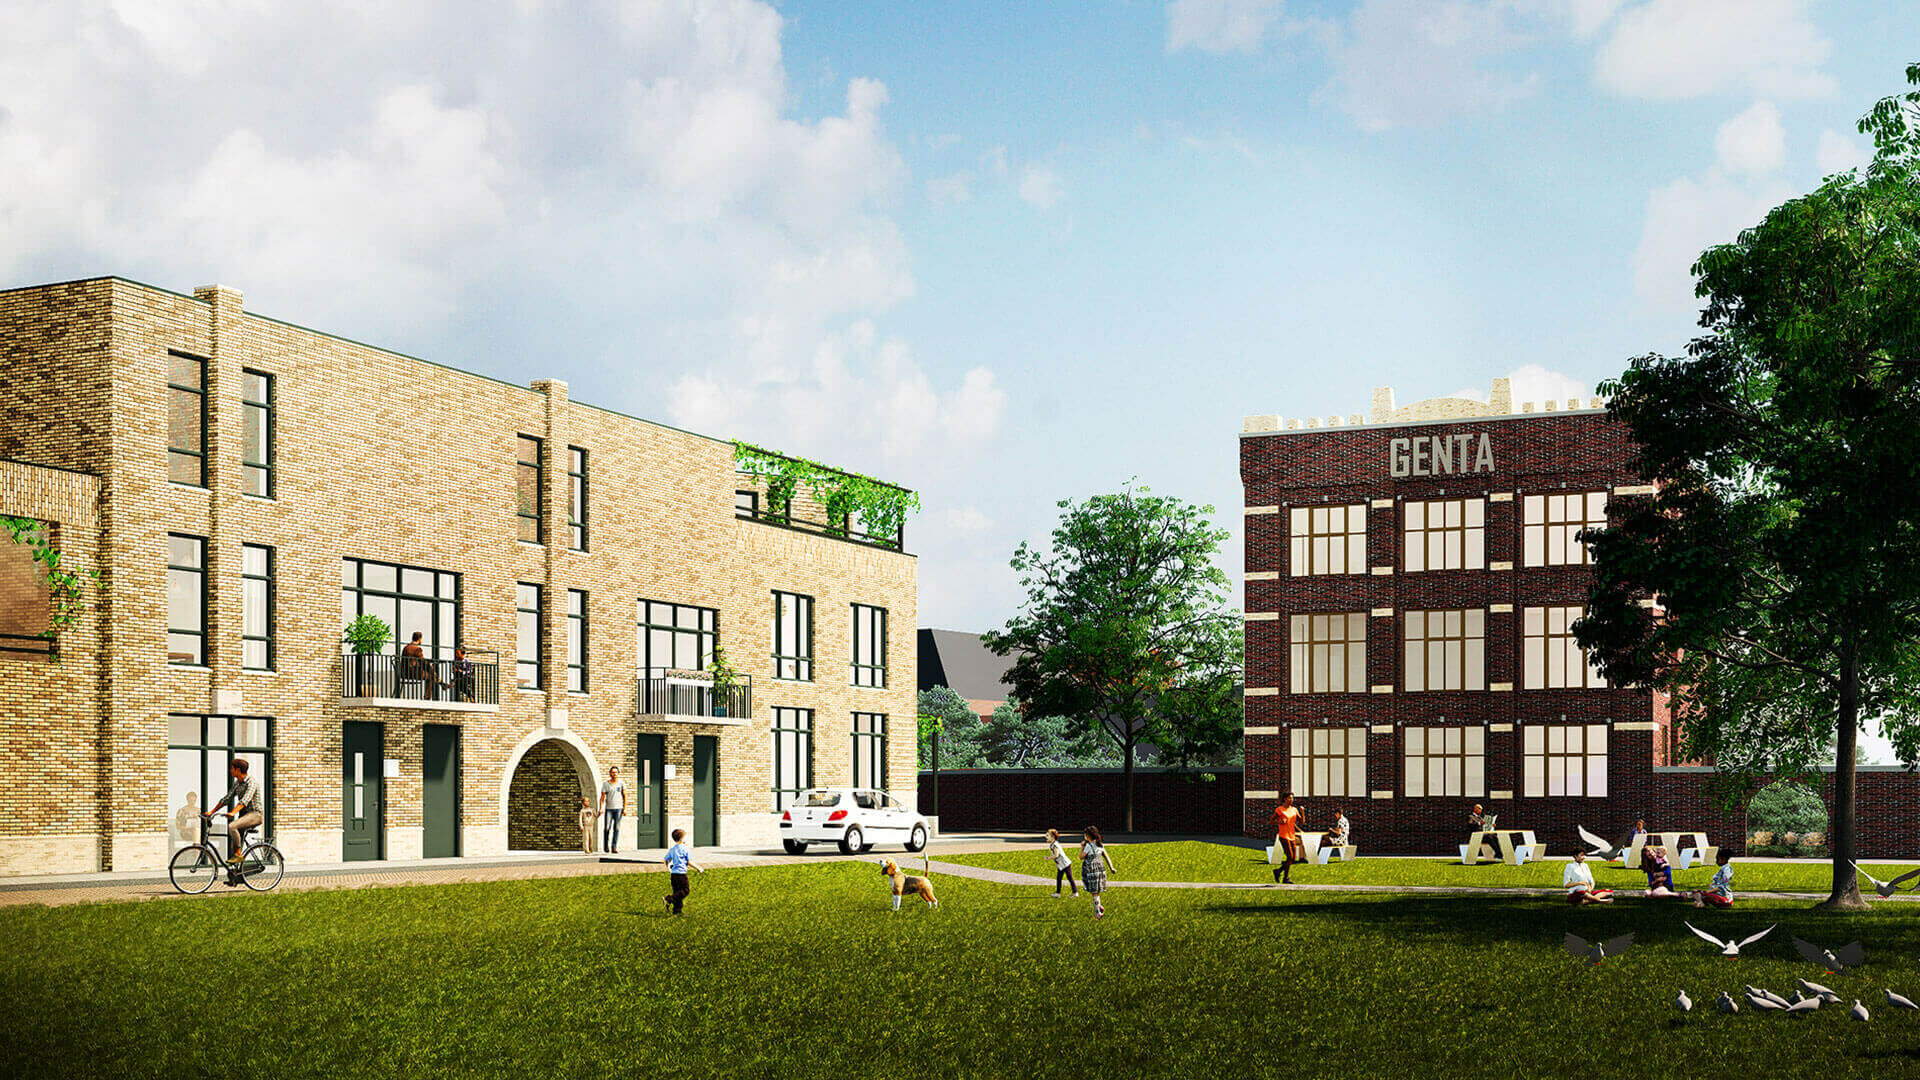 Tuinen van Genta - project - Breda - yoreM - Impressie 04